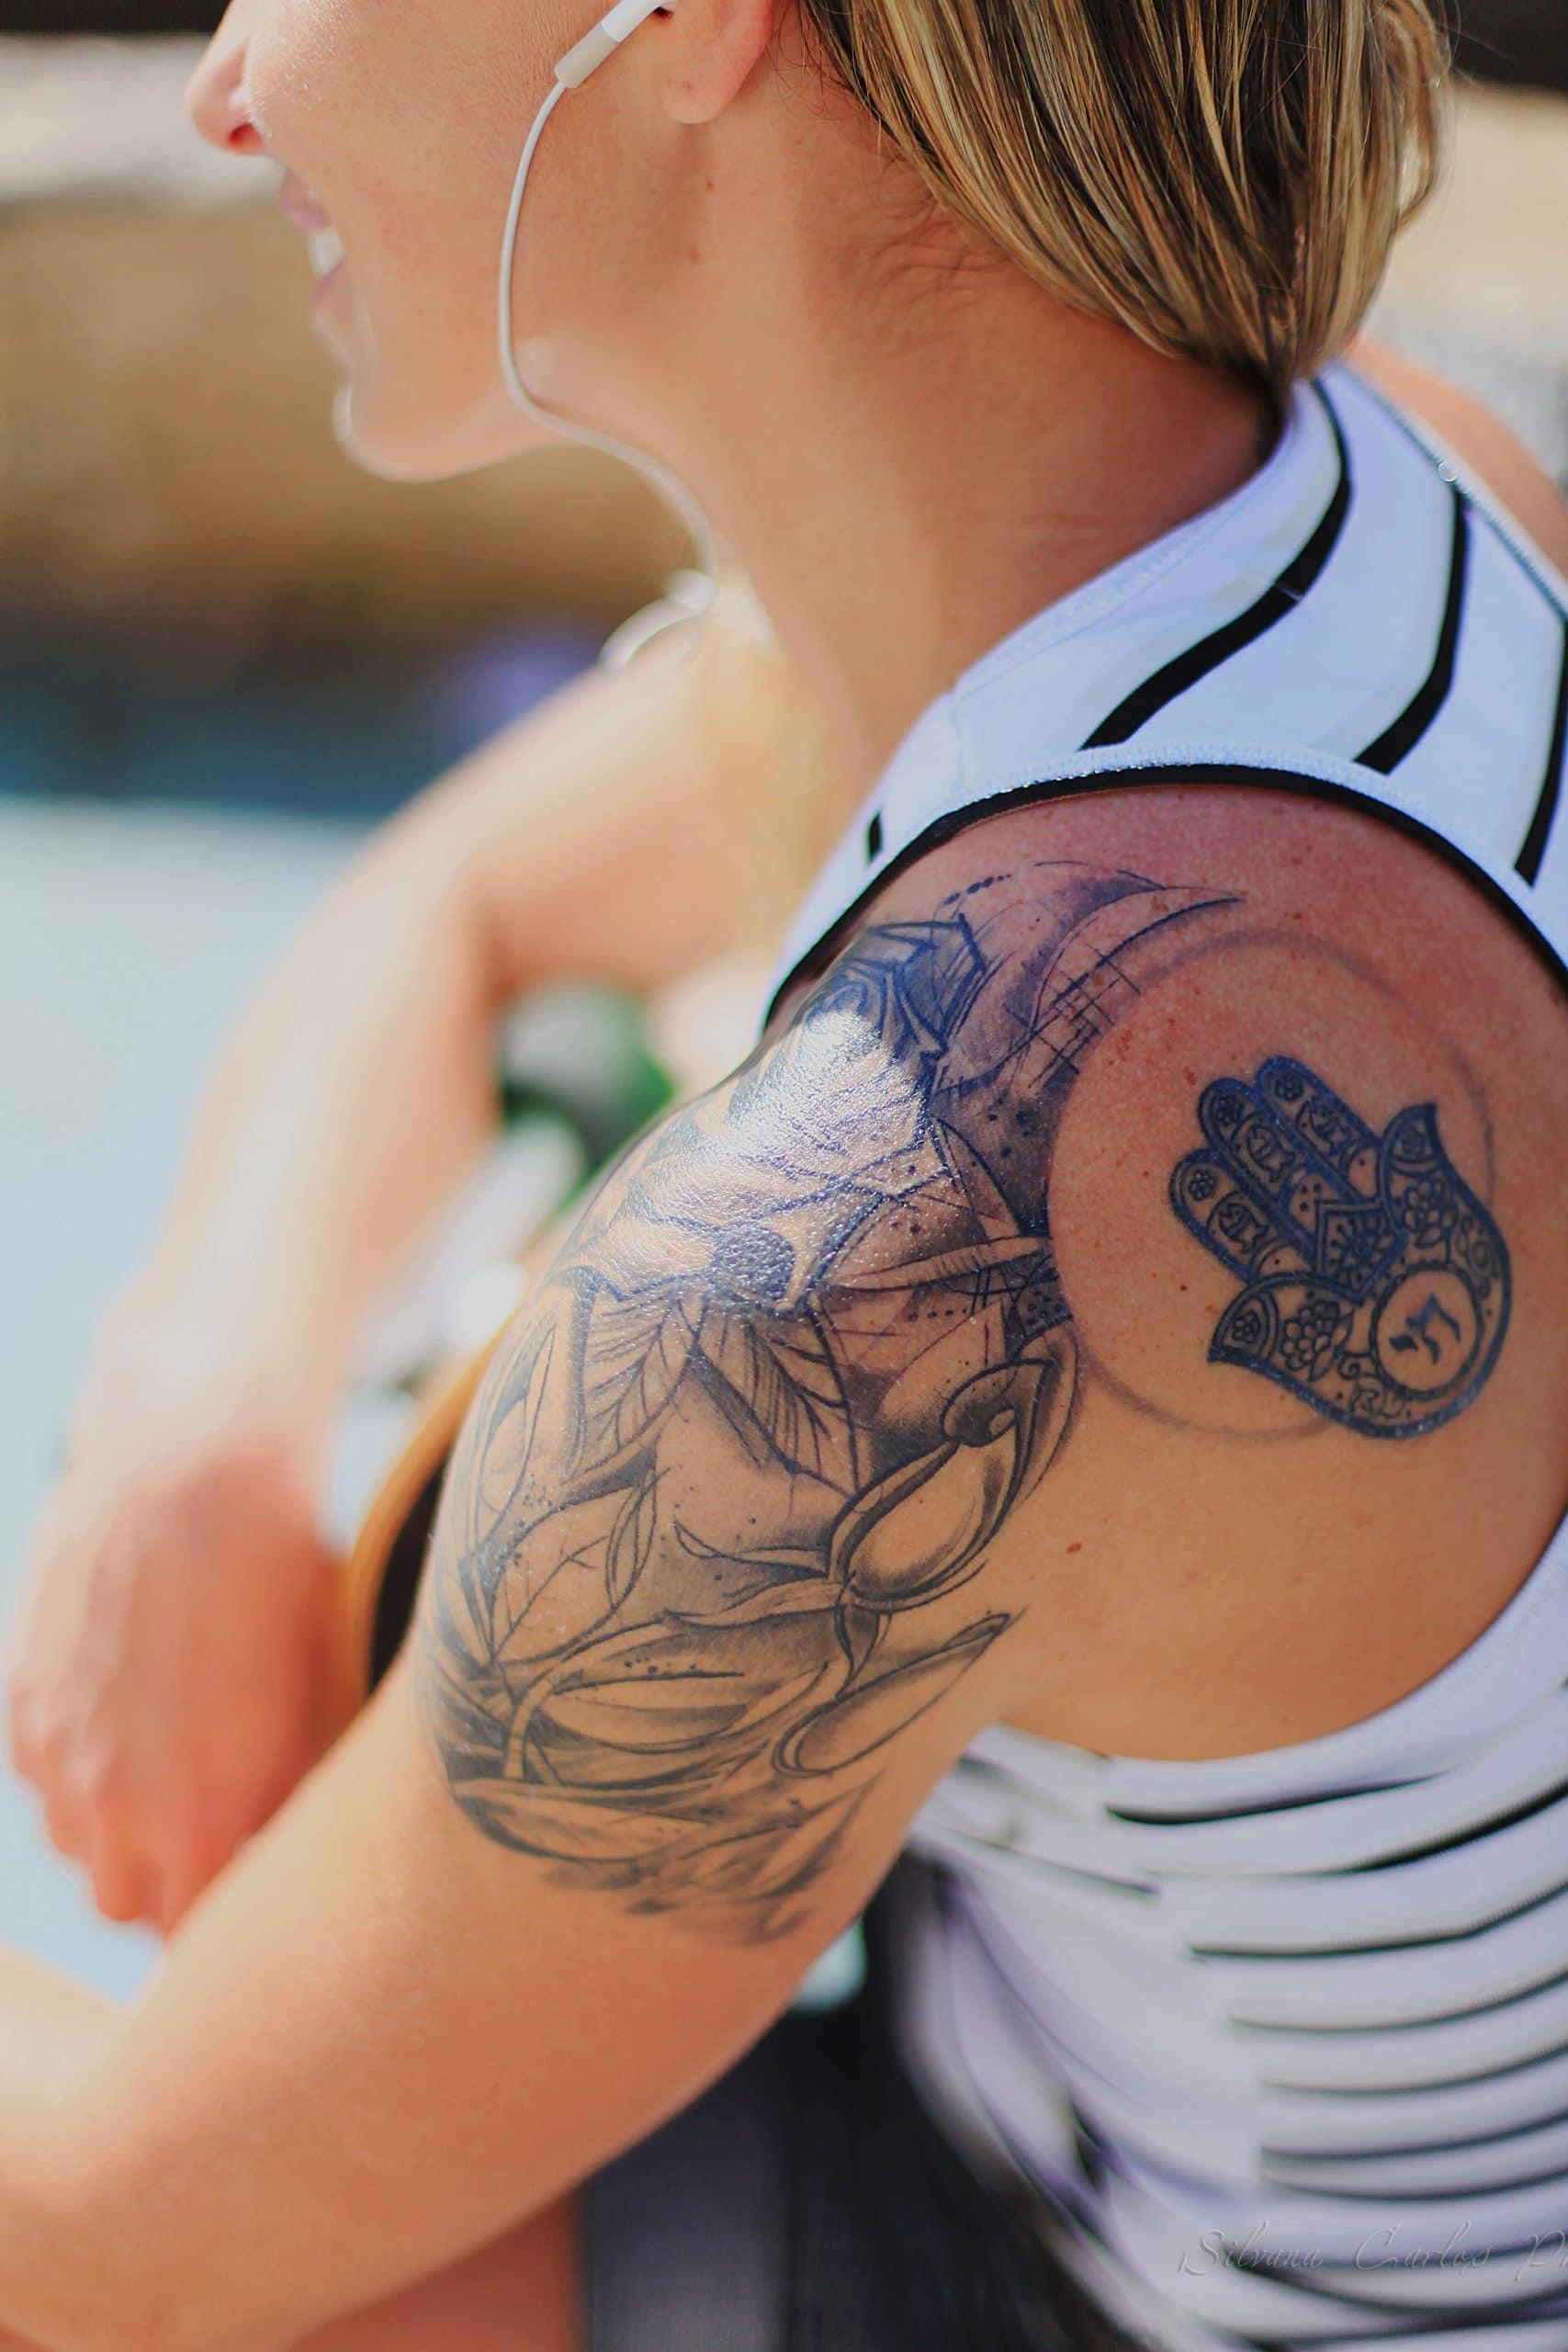 are tattoos vegan?